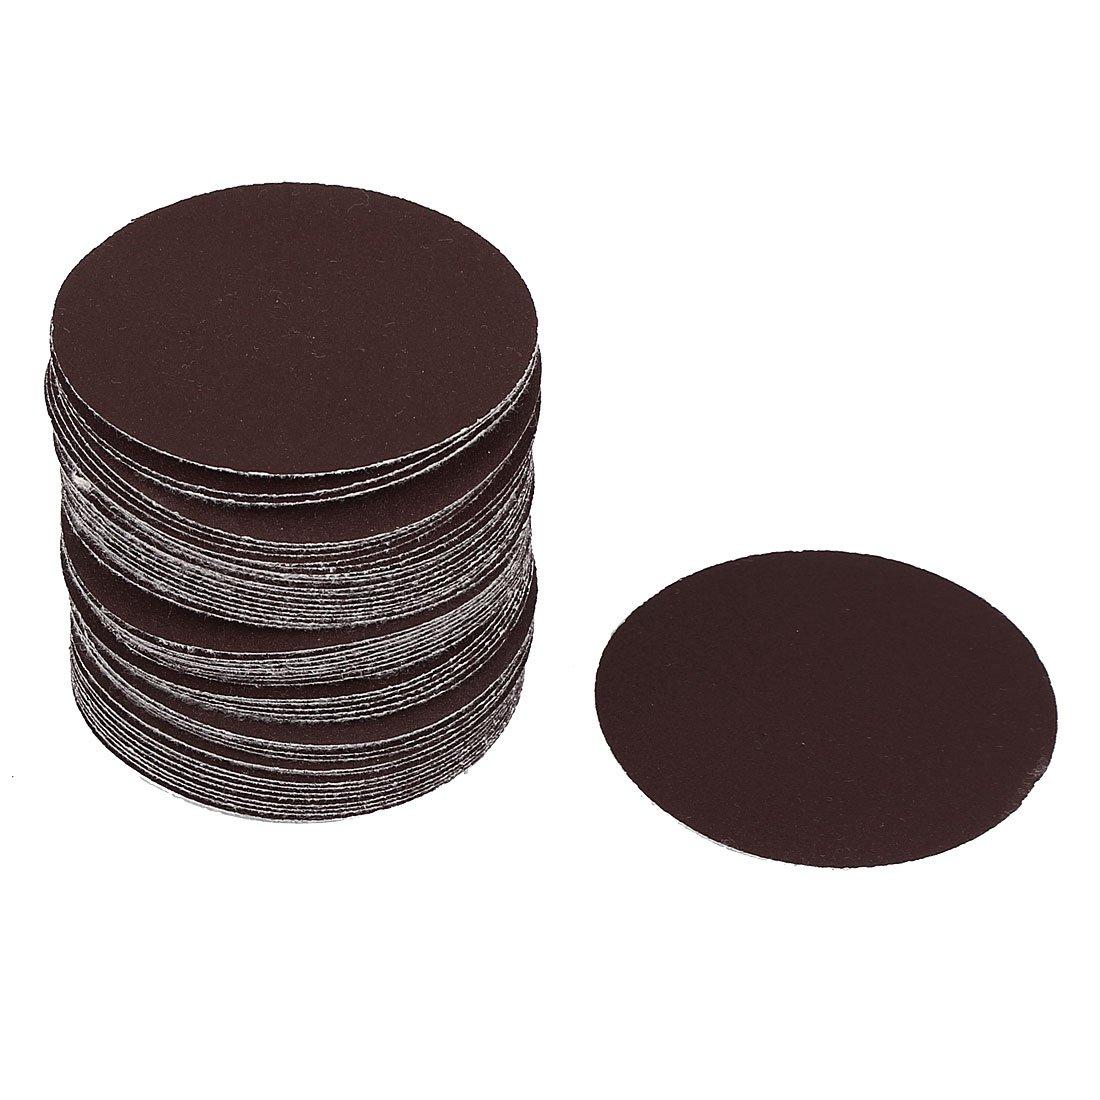 Uxcell a16031000ux0889 3'' Dia 180 Grit Abrasive Sanding Paper Disc Flocking Sandpaper (Pack of 50)